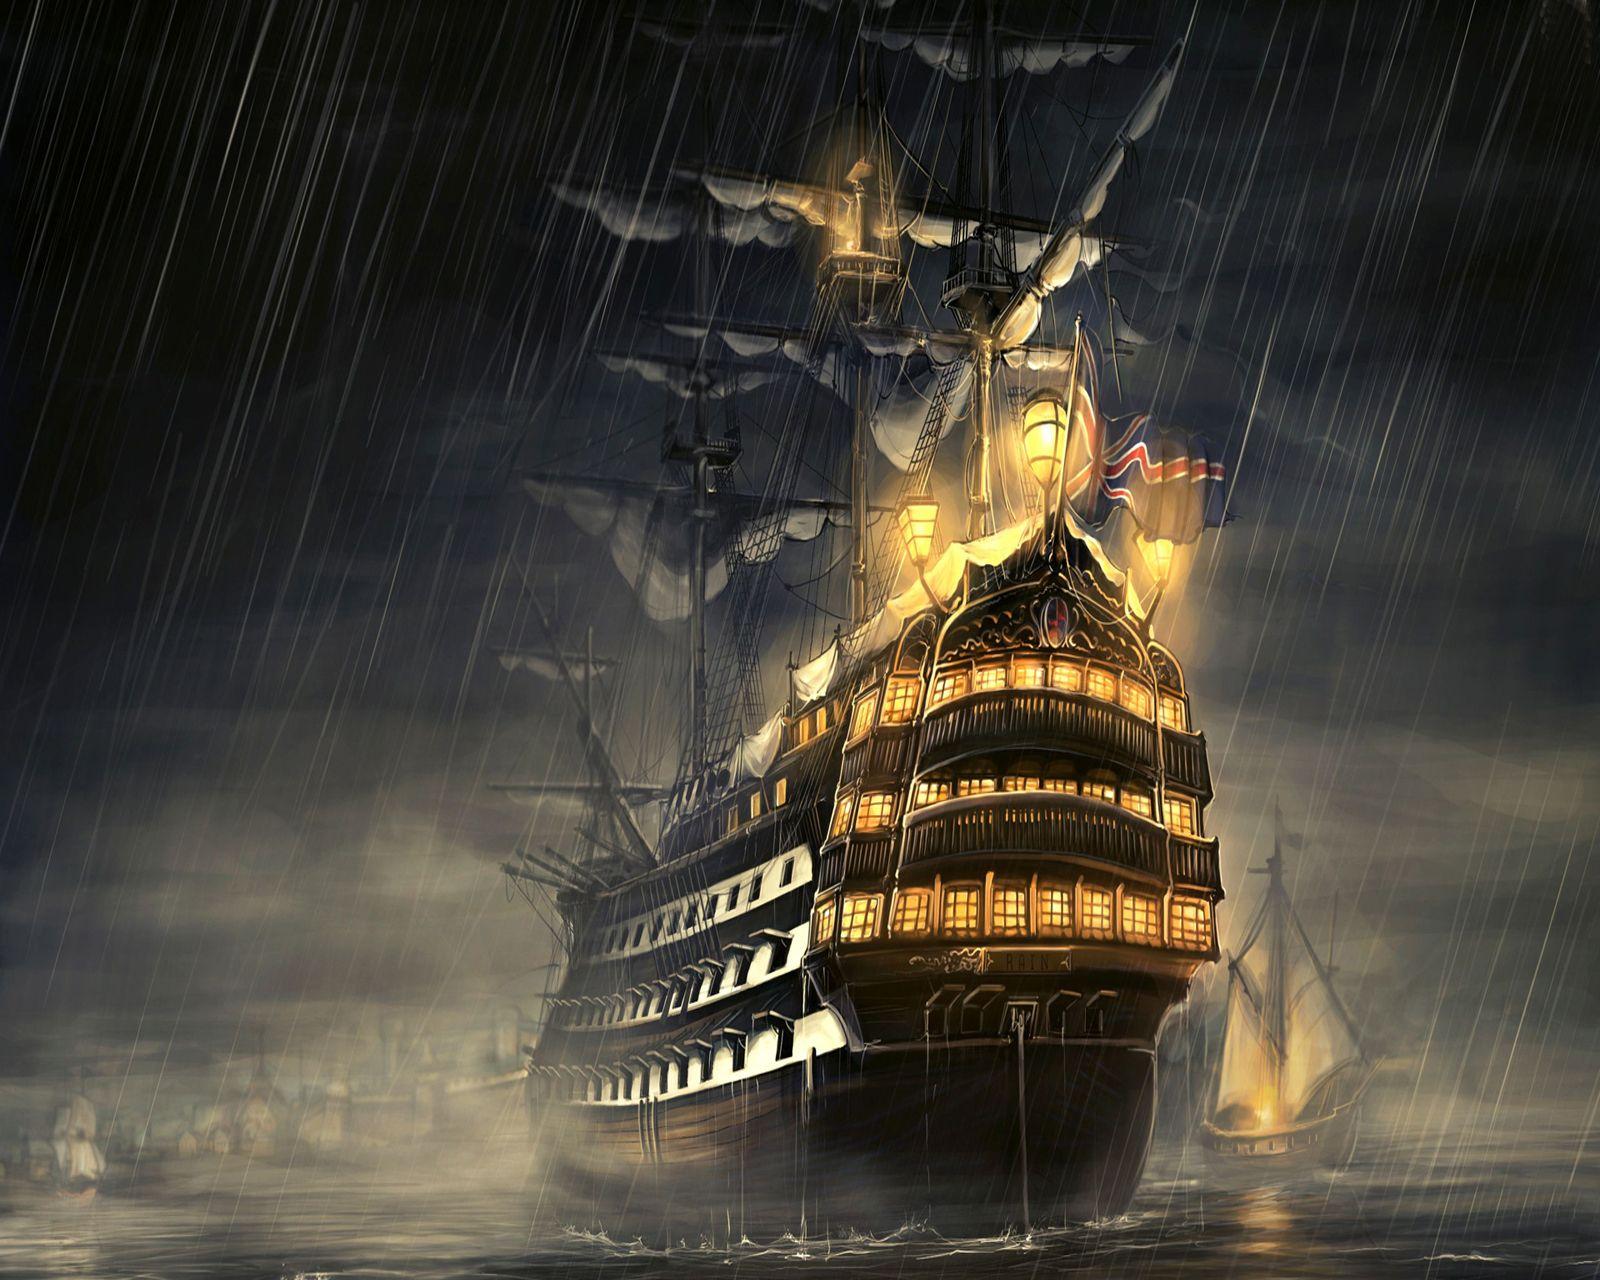 Ship HD Wallpapers Backgrounds Wallpaper × Pirate Ships